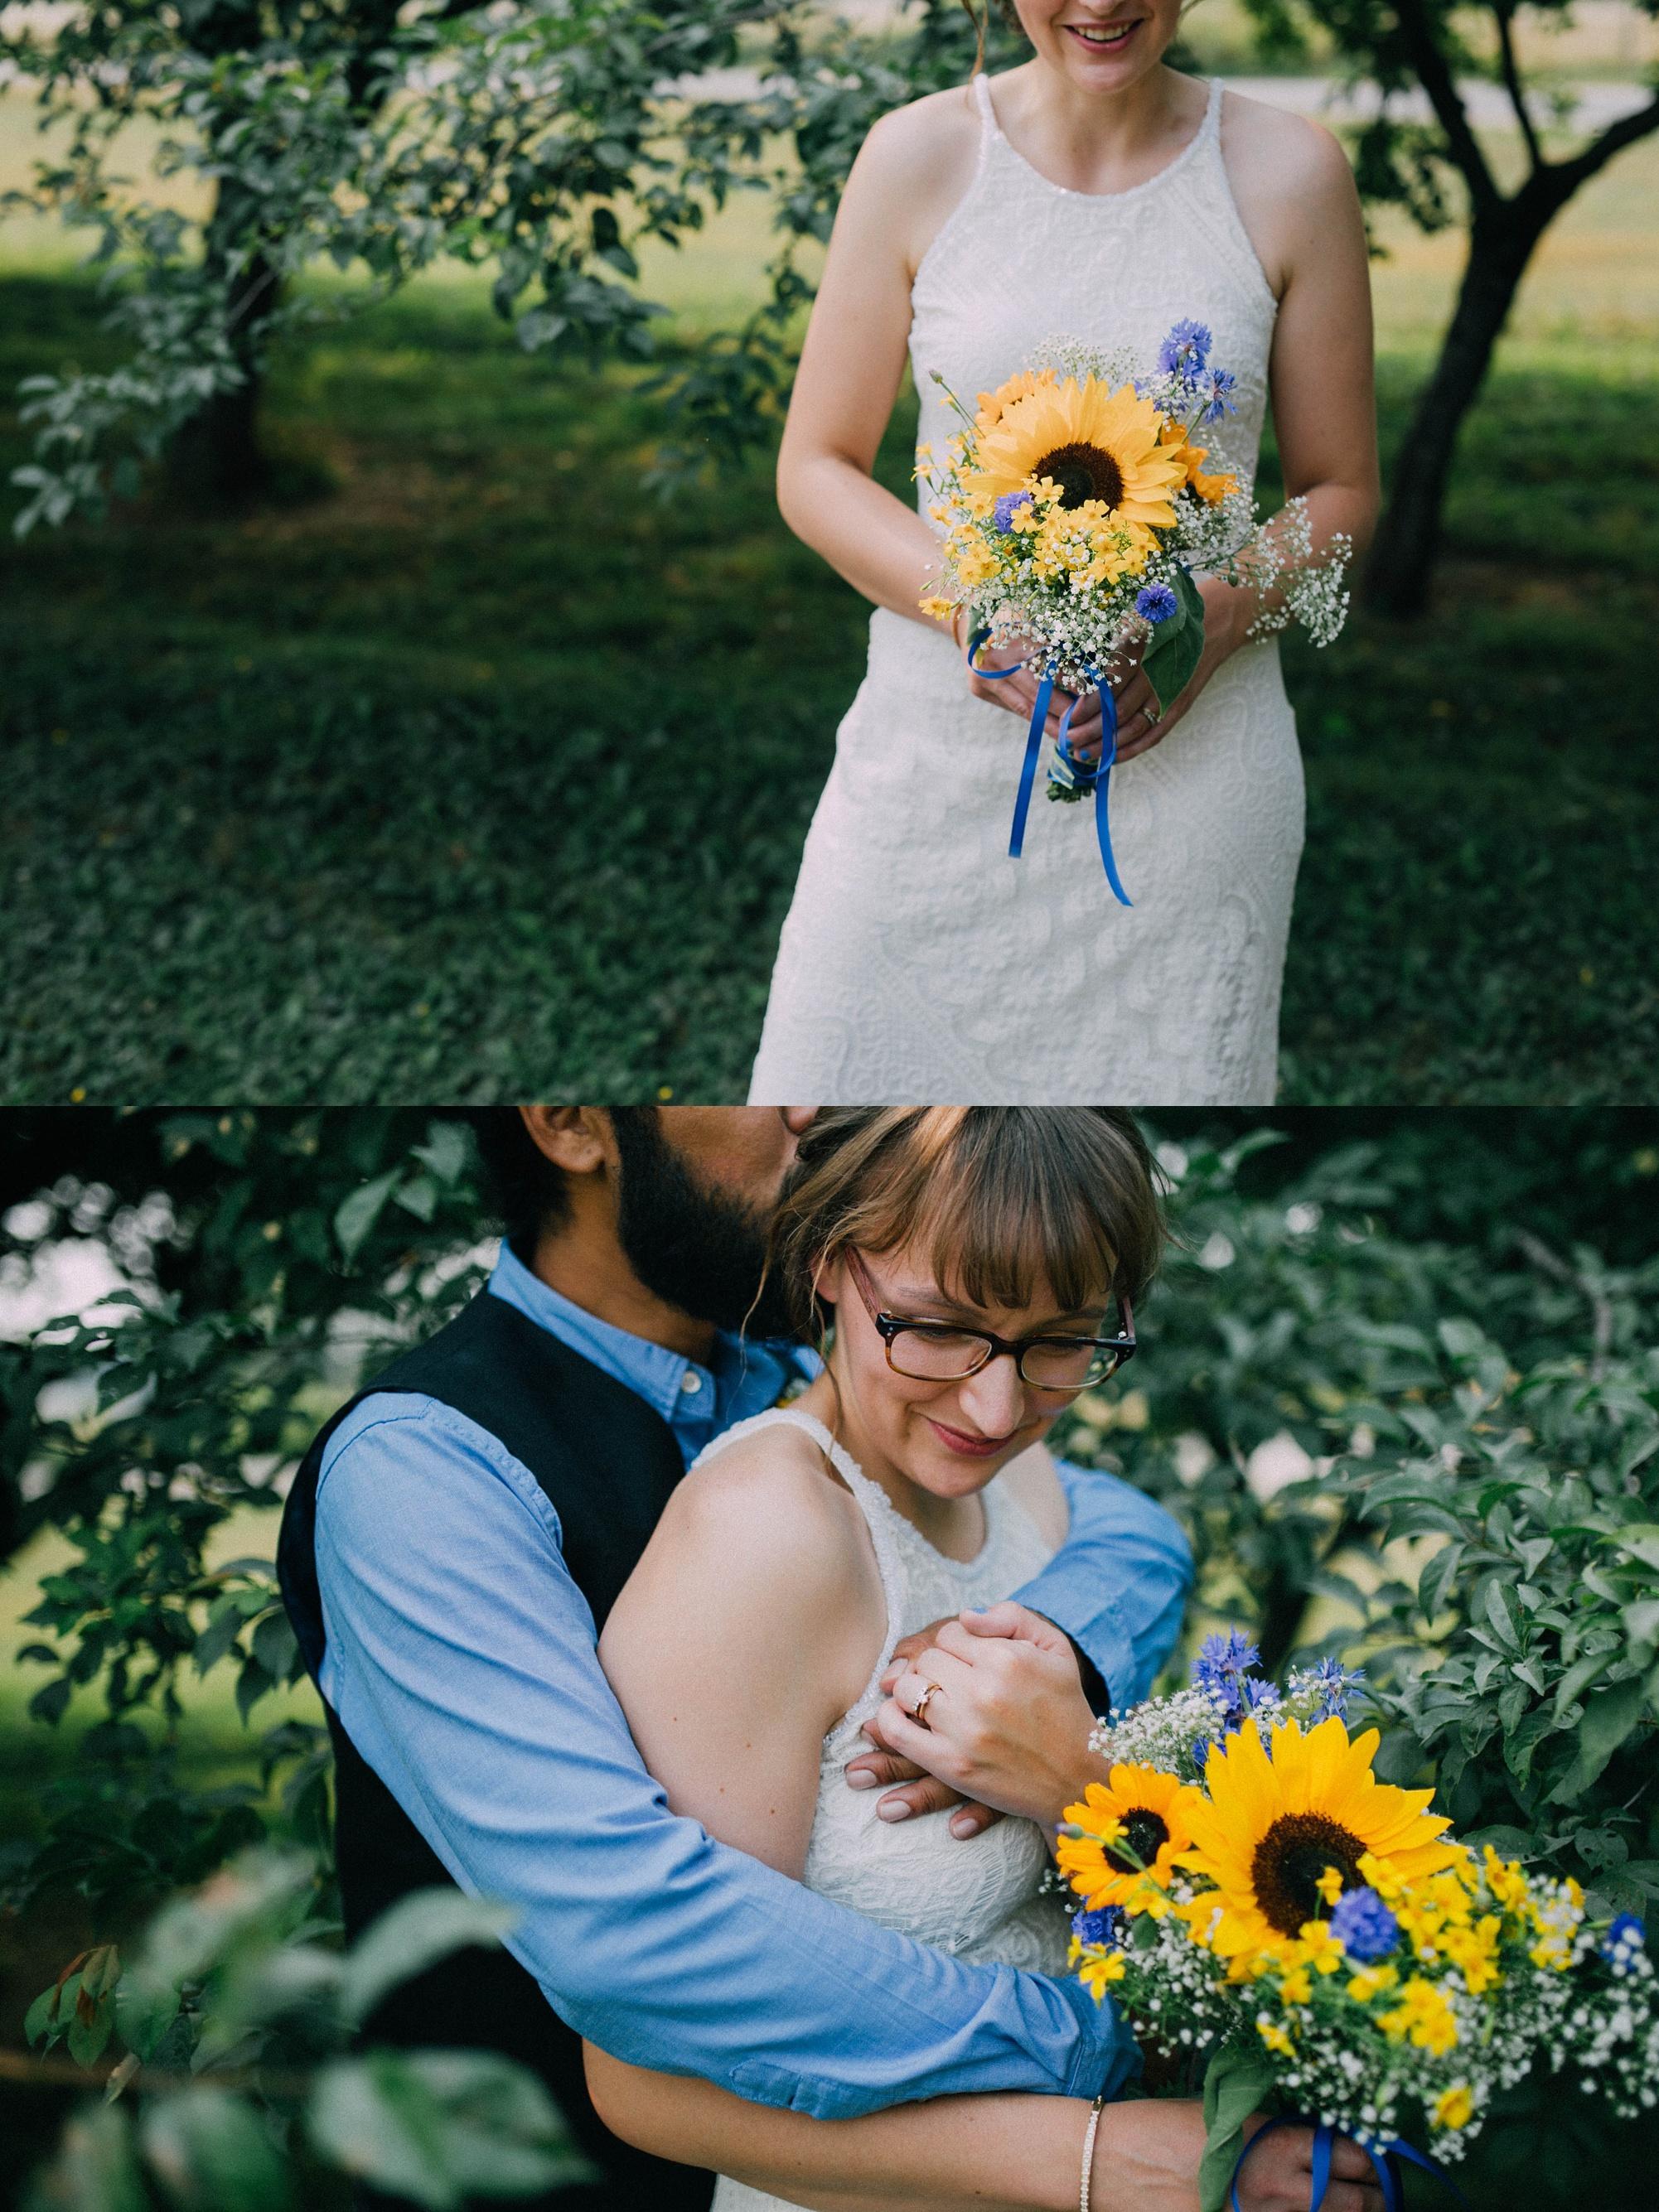 ashley_vos_seattle_ wedding_photographer_0459.jpg